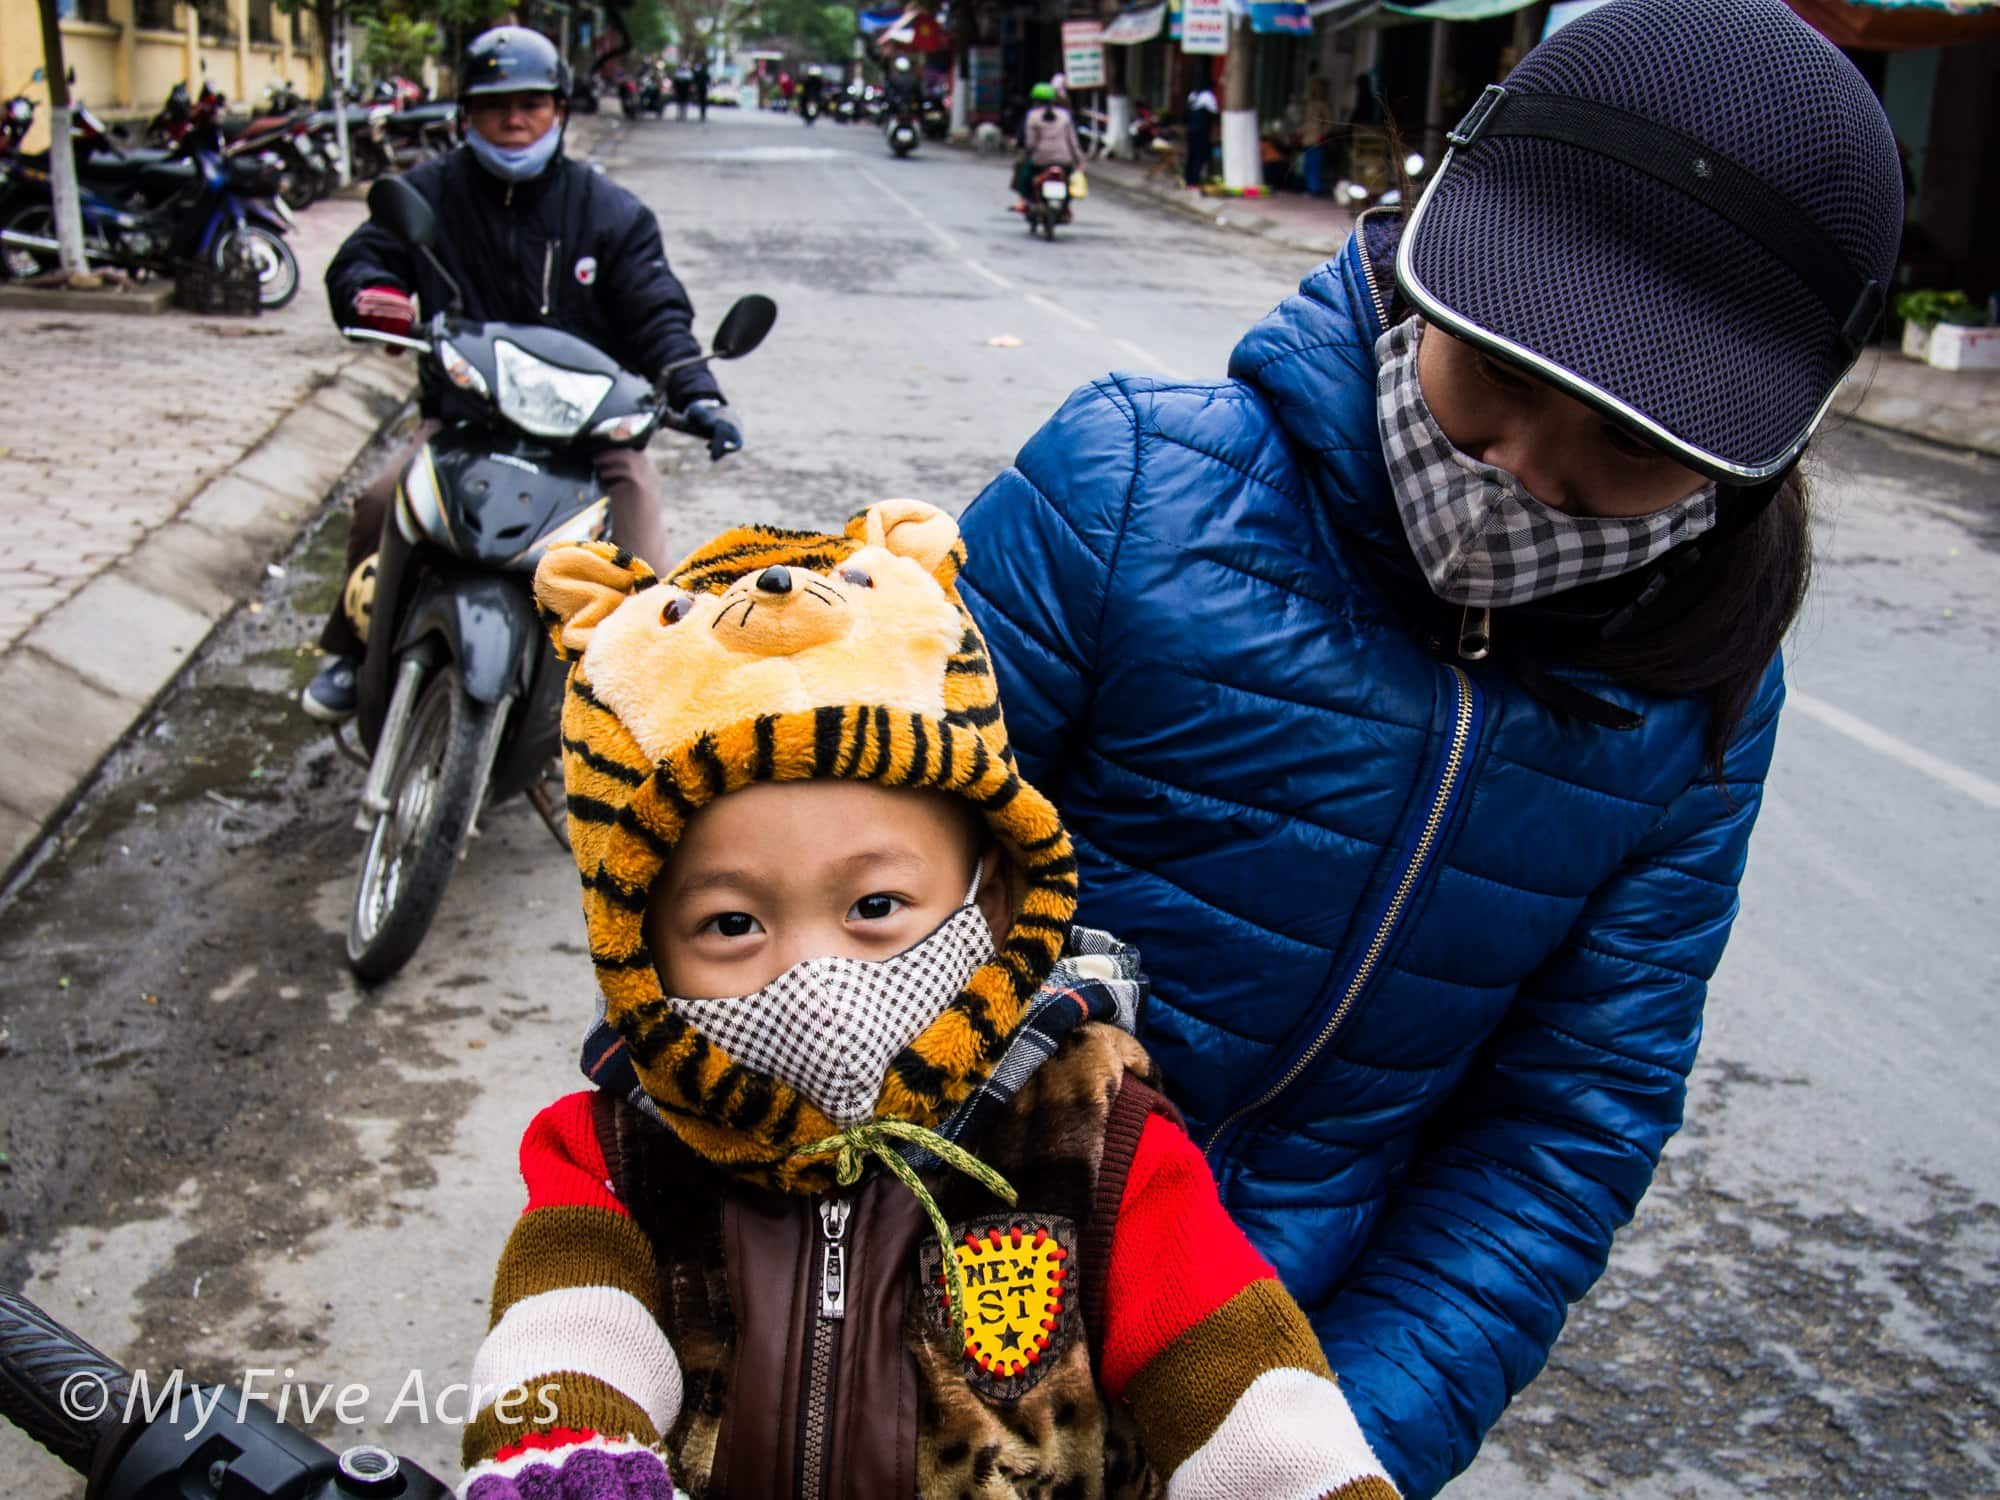 Kid on a motorbike - Vietnam Travel Photos